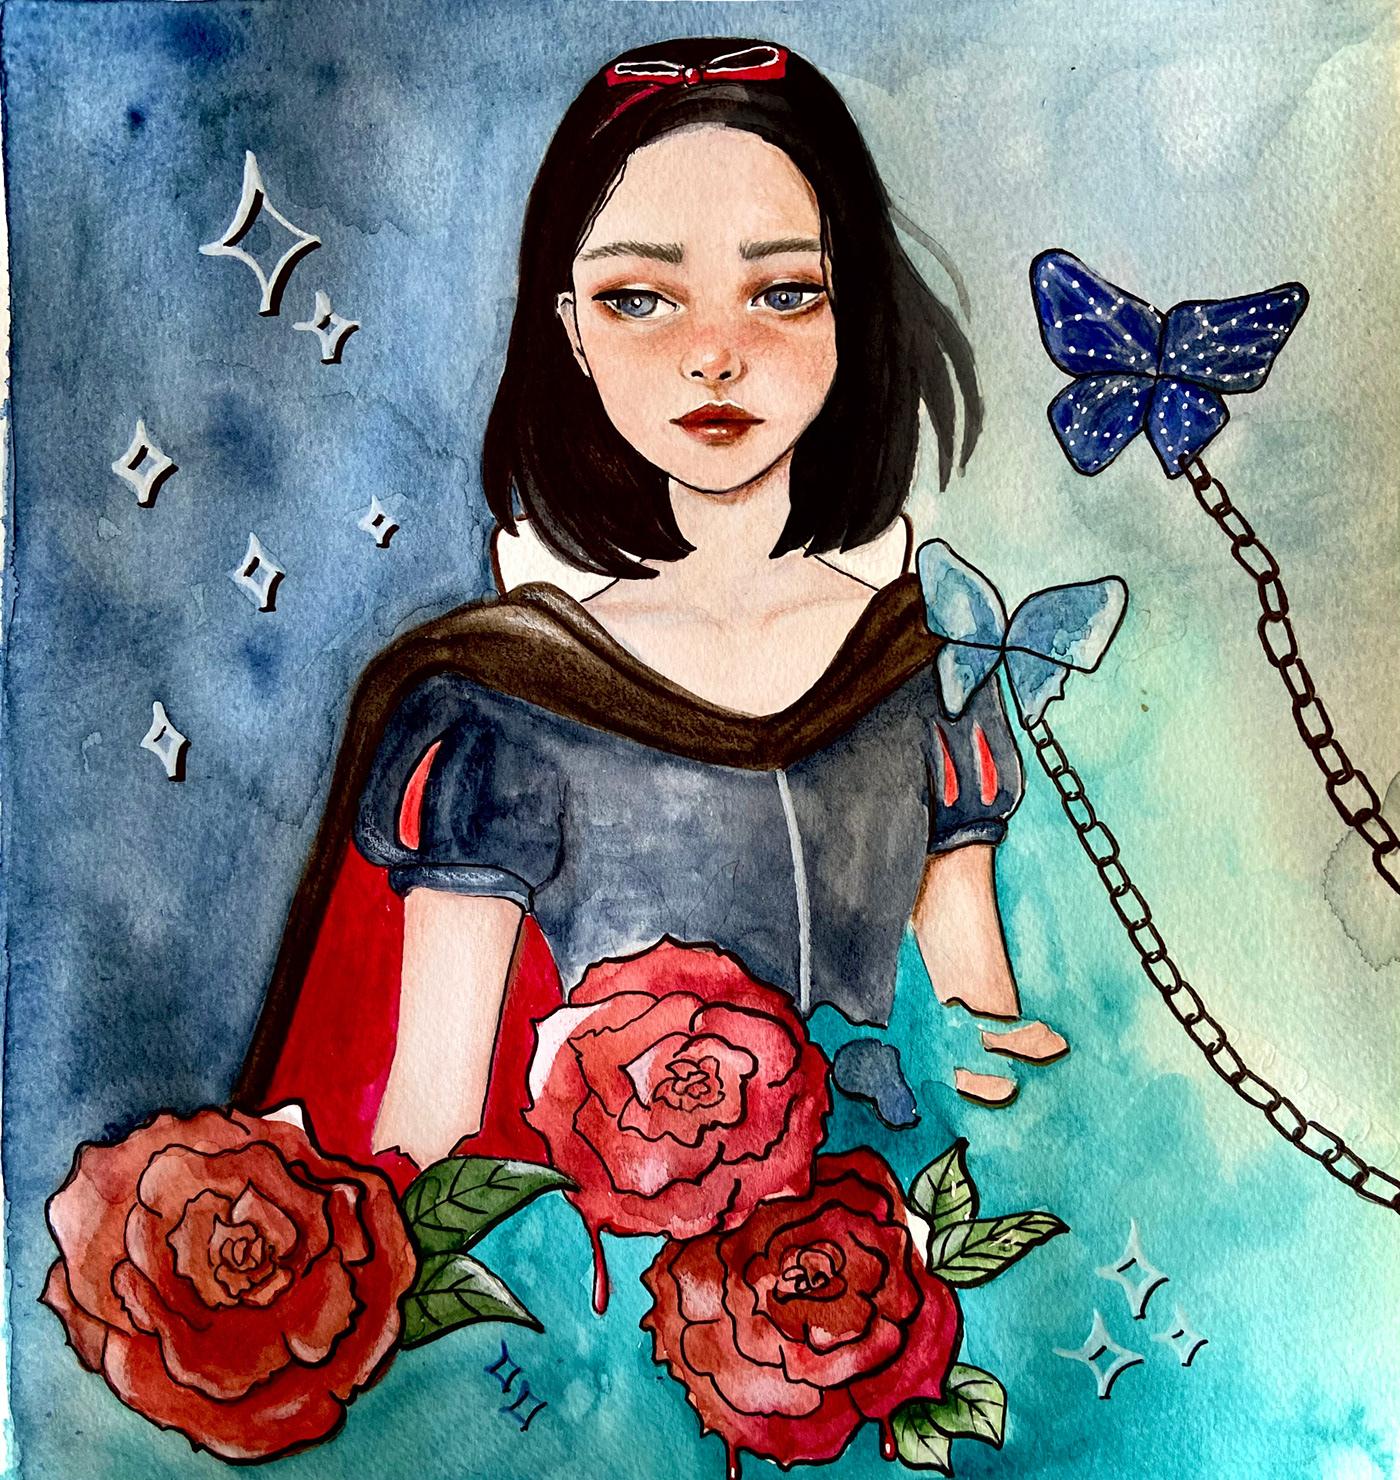 art disney ILLUSTRATION  Princess snowwhite watercolor